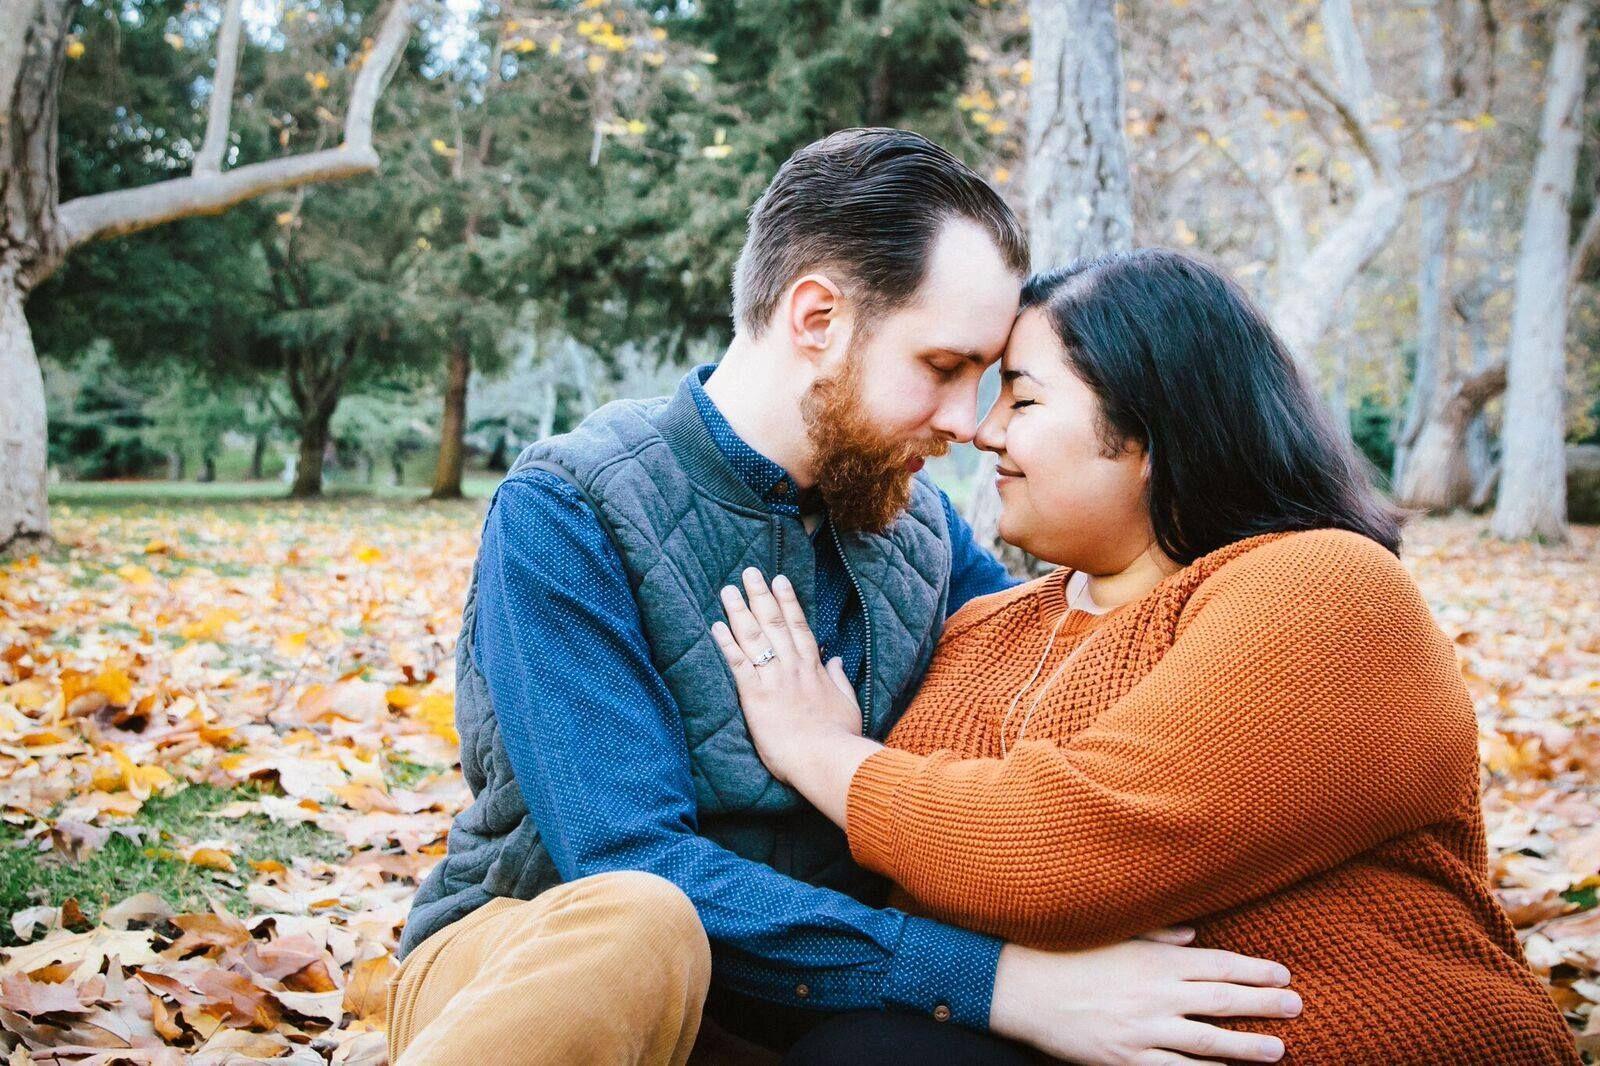 plus size bride intimate engagement pose photo ideas